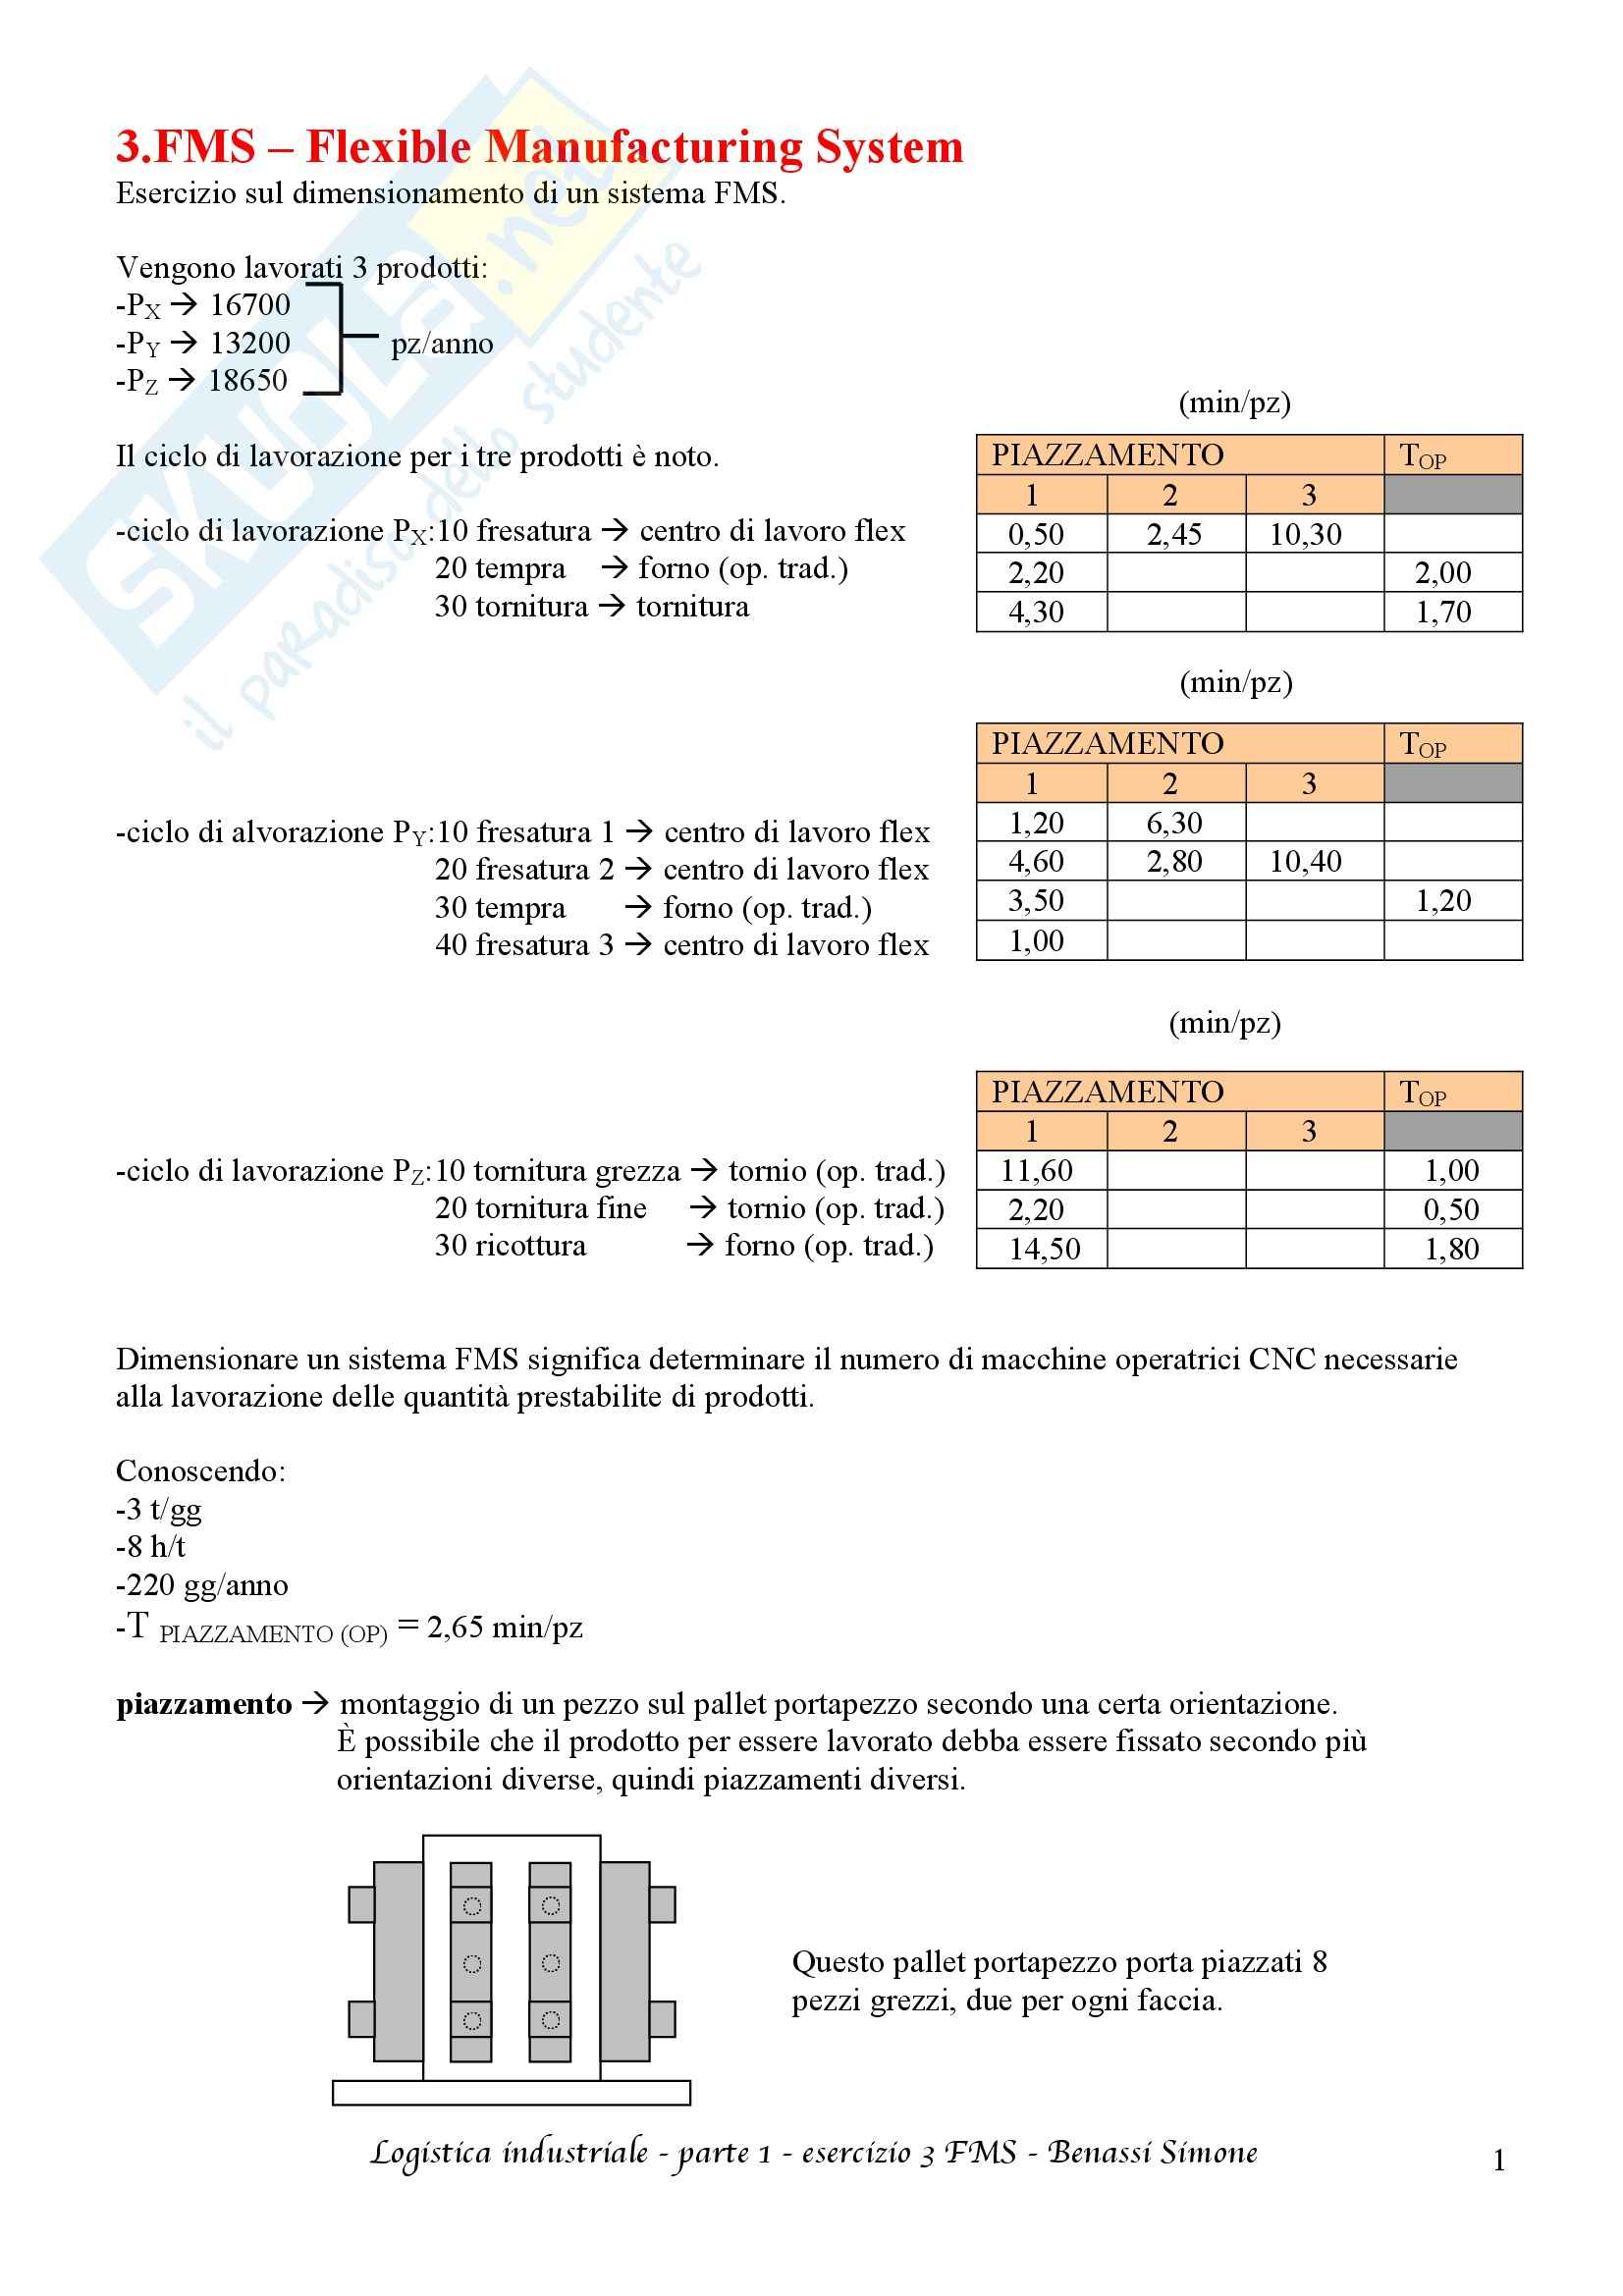 Logistica industriale T-AB - Appunti prima parte Pag. 66